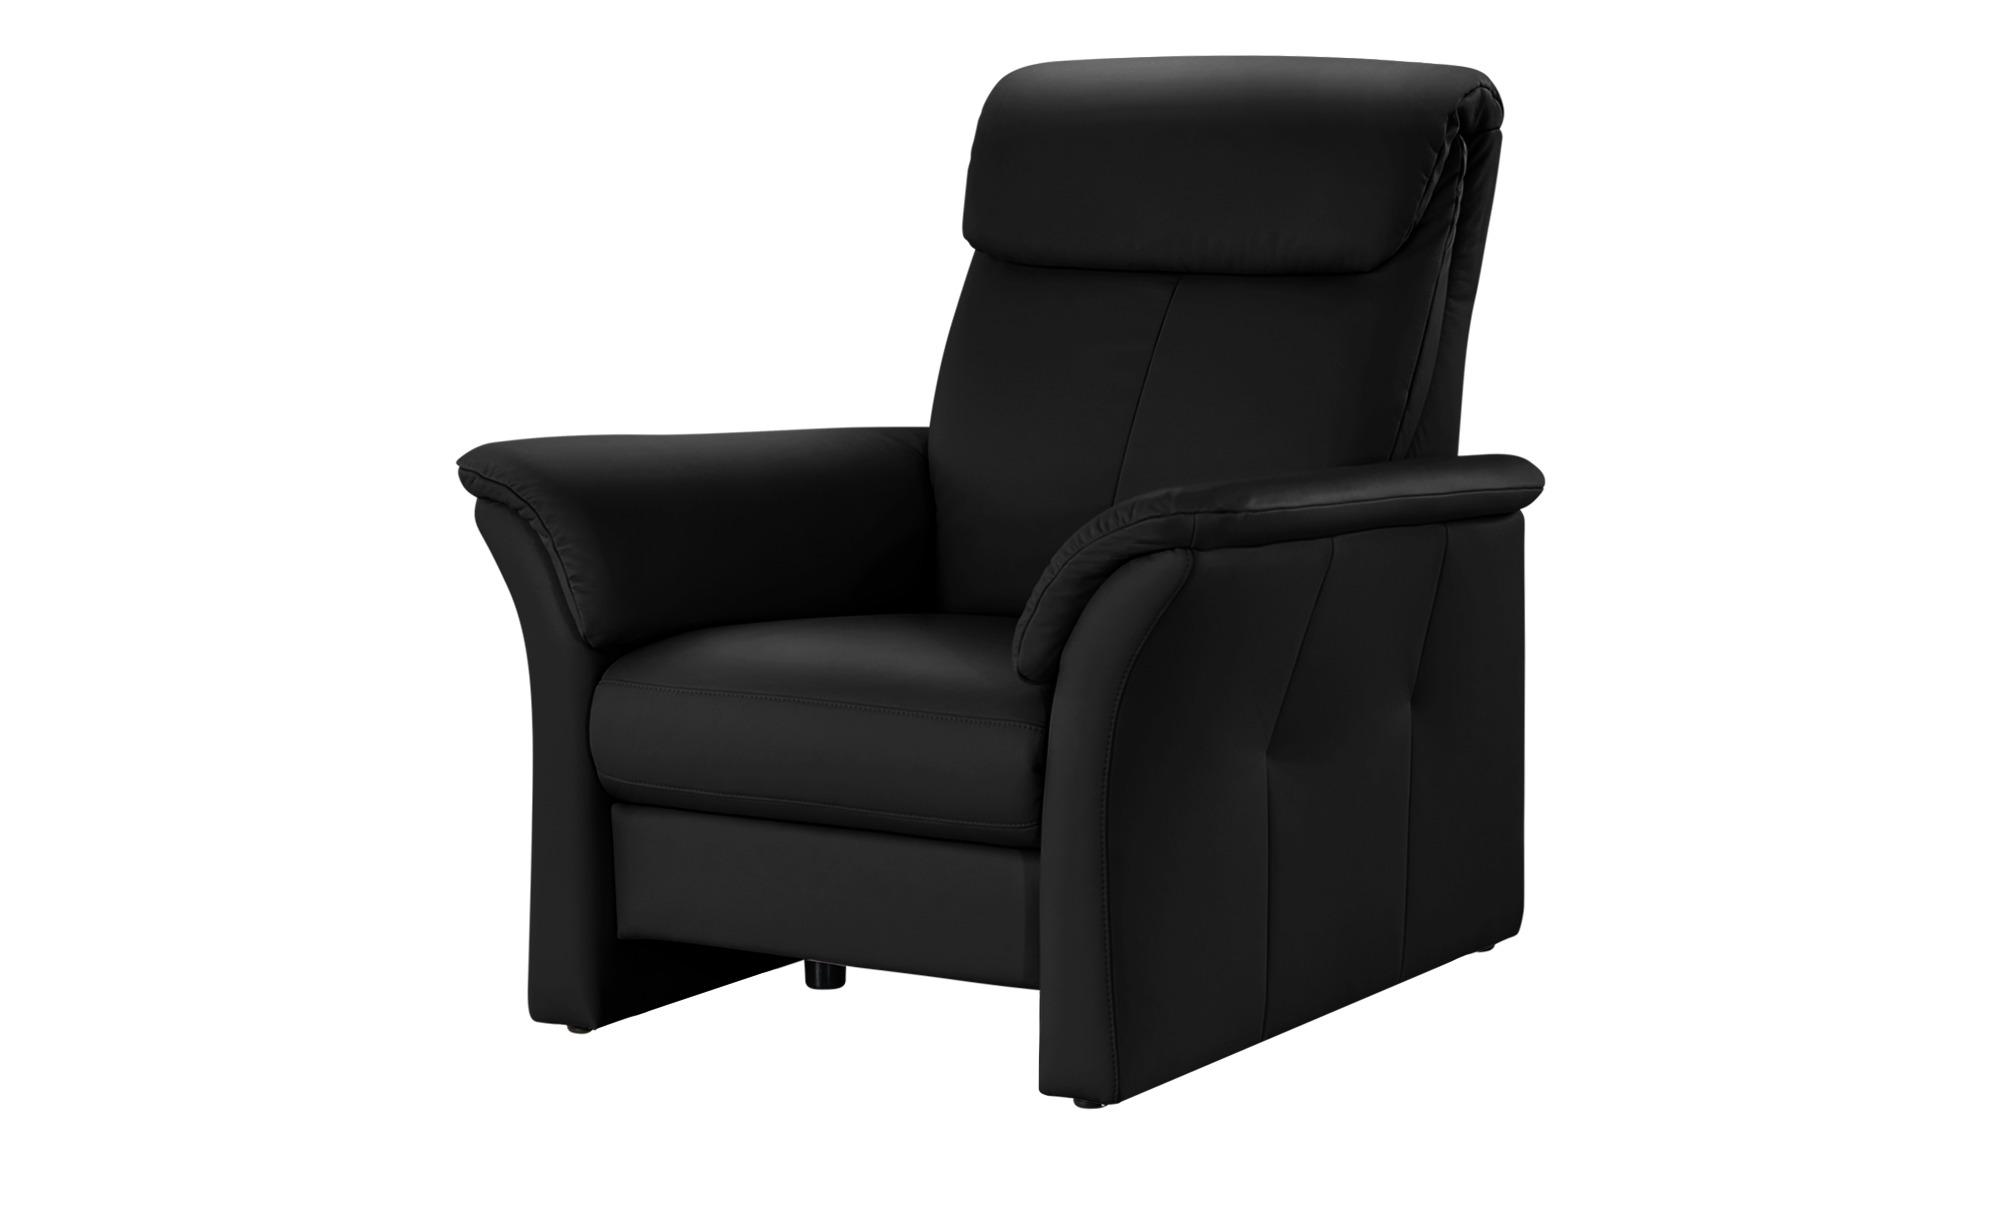 Wohnwert Ledersessel  Lena ¦ schwarz ¦ Maße (cm): B: 104,5 H: 107 T: 97 Polstermöbel > Sessel > Ledersessel - Höffner